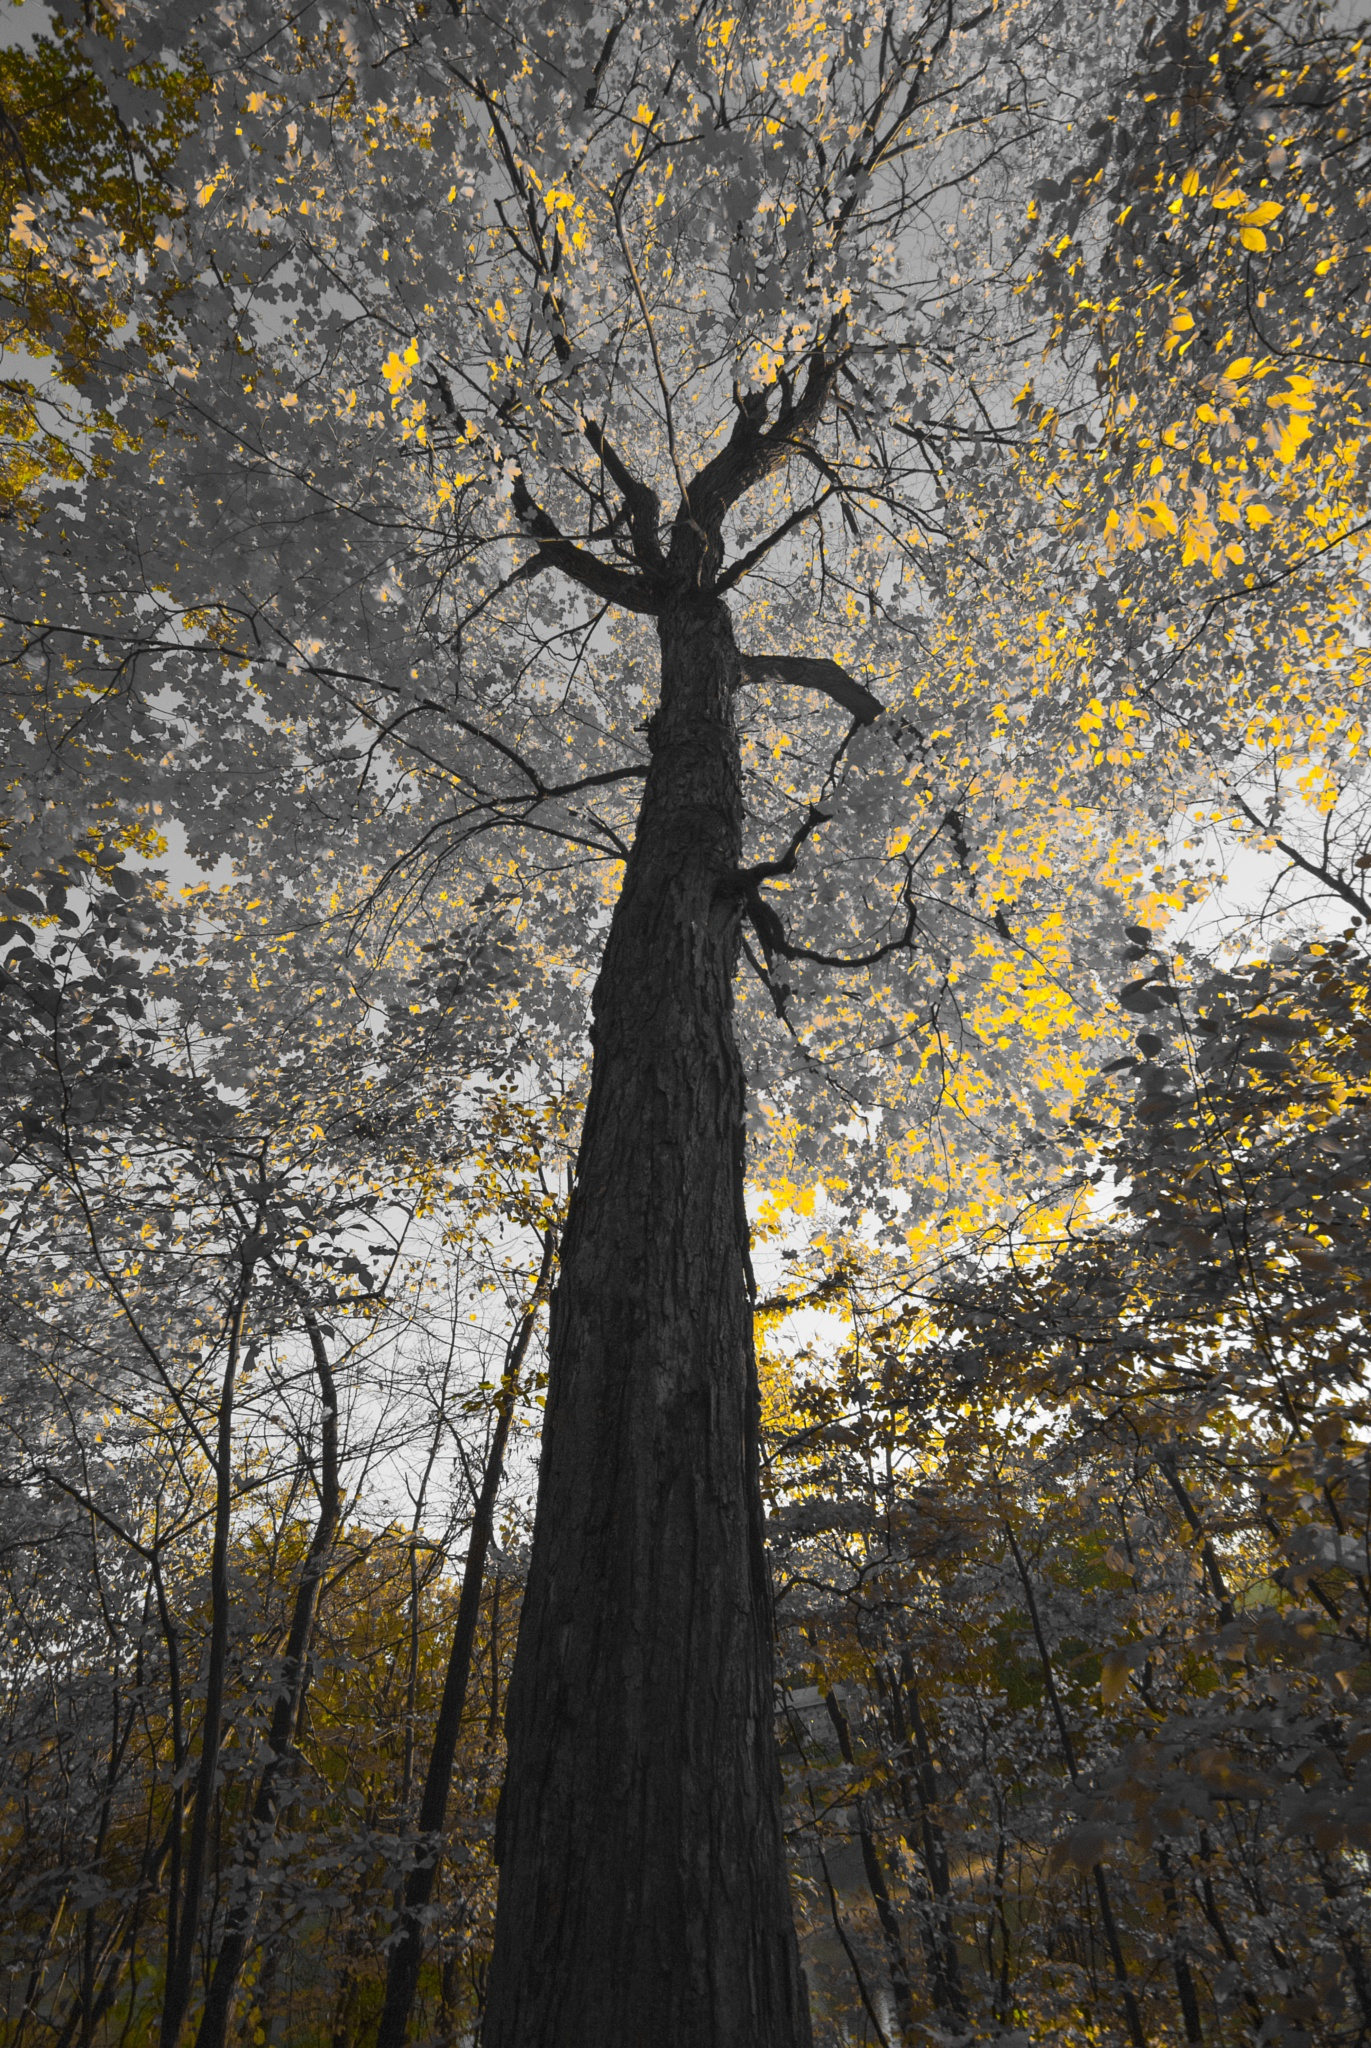 Autumn Art by Eugenie Robitaille